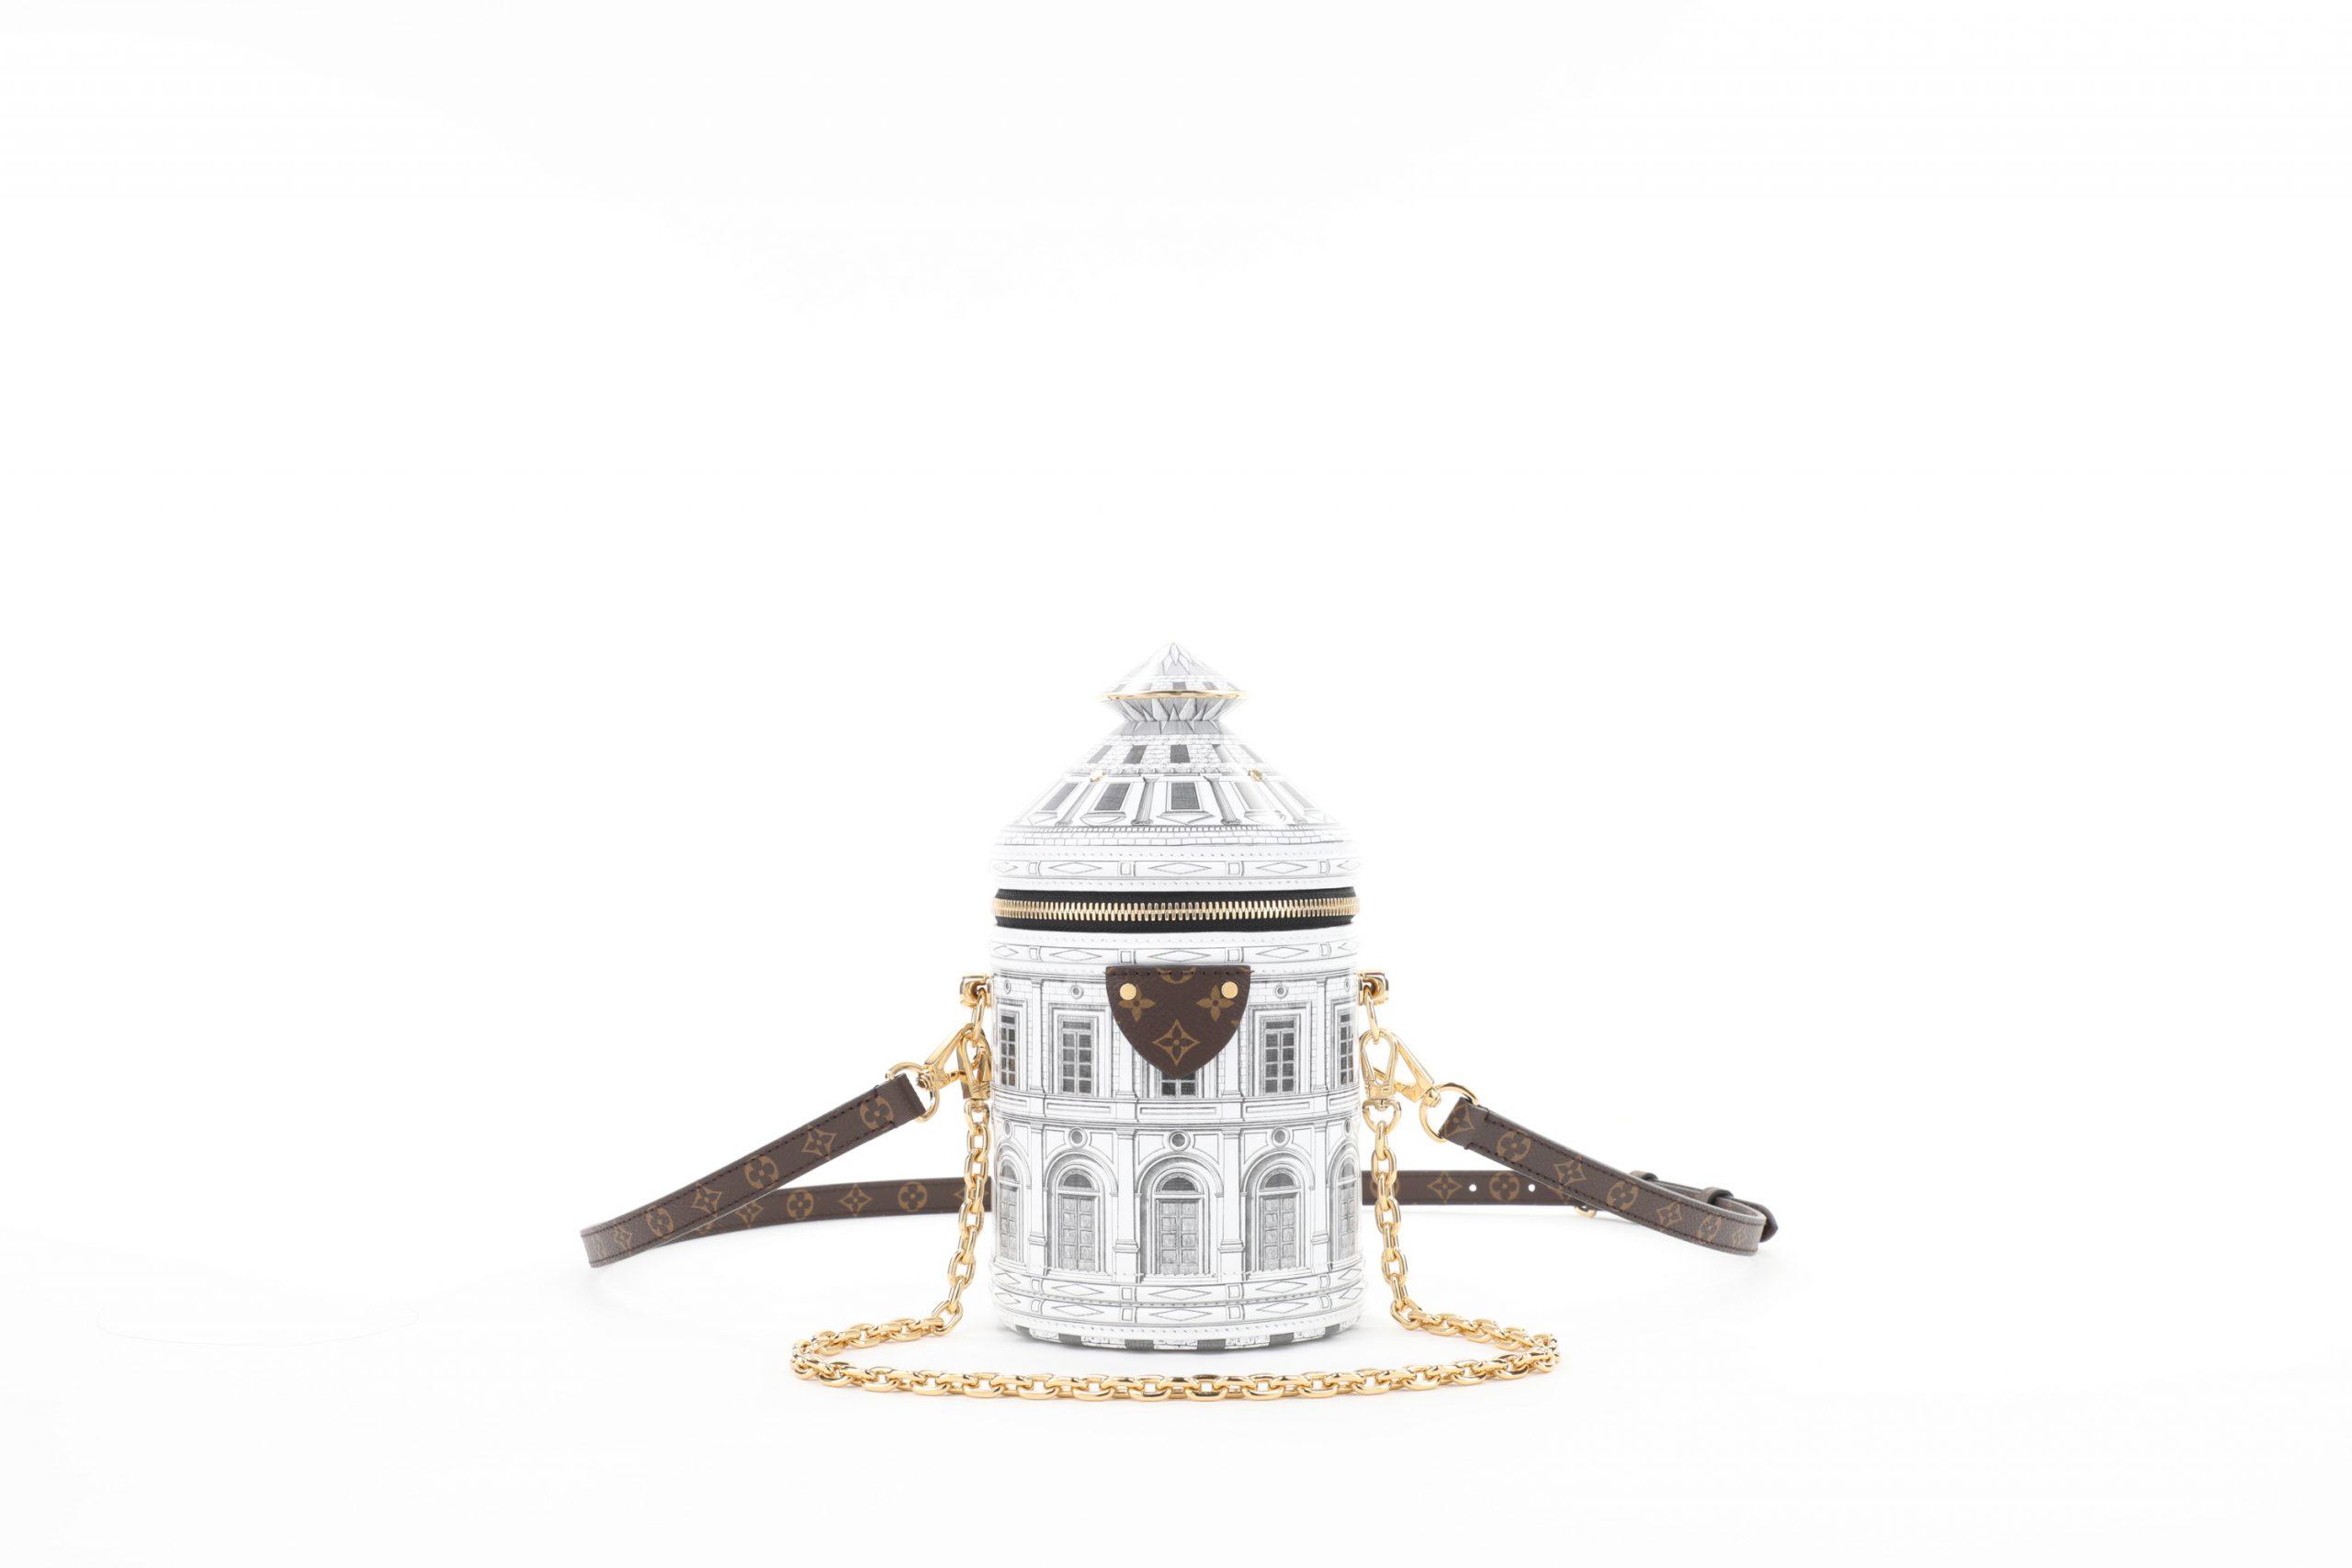 Túi xách Louis Vuitton x Fornasetti